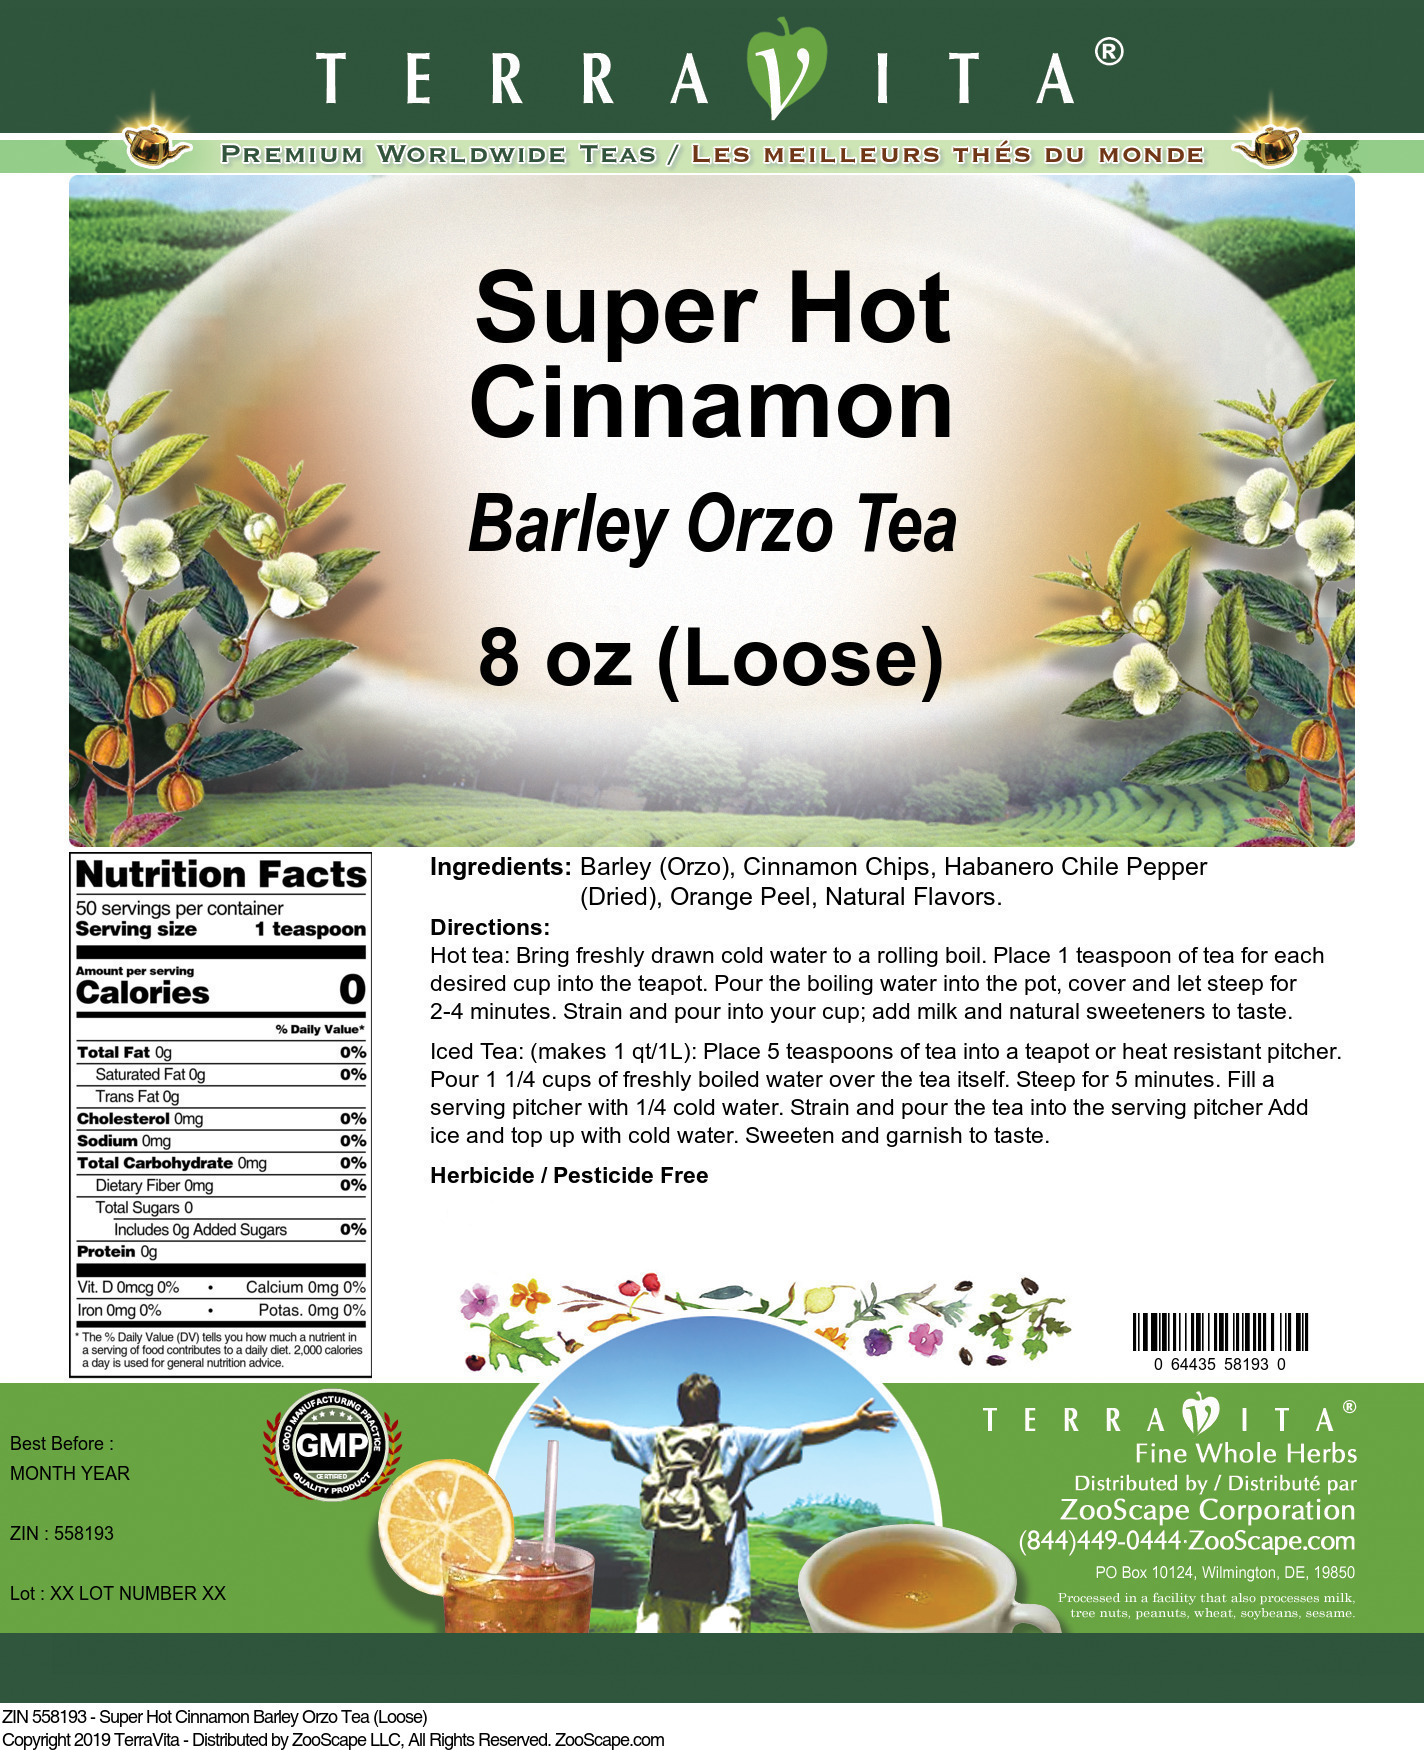 Super Hot Cinnamon Barley Orzo